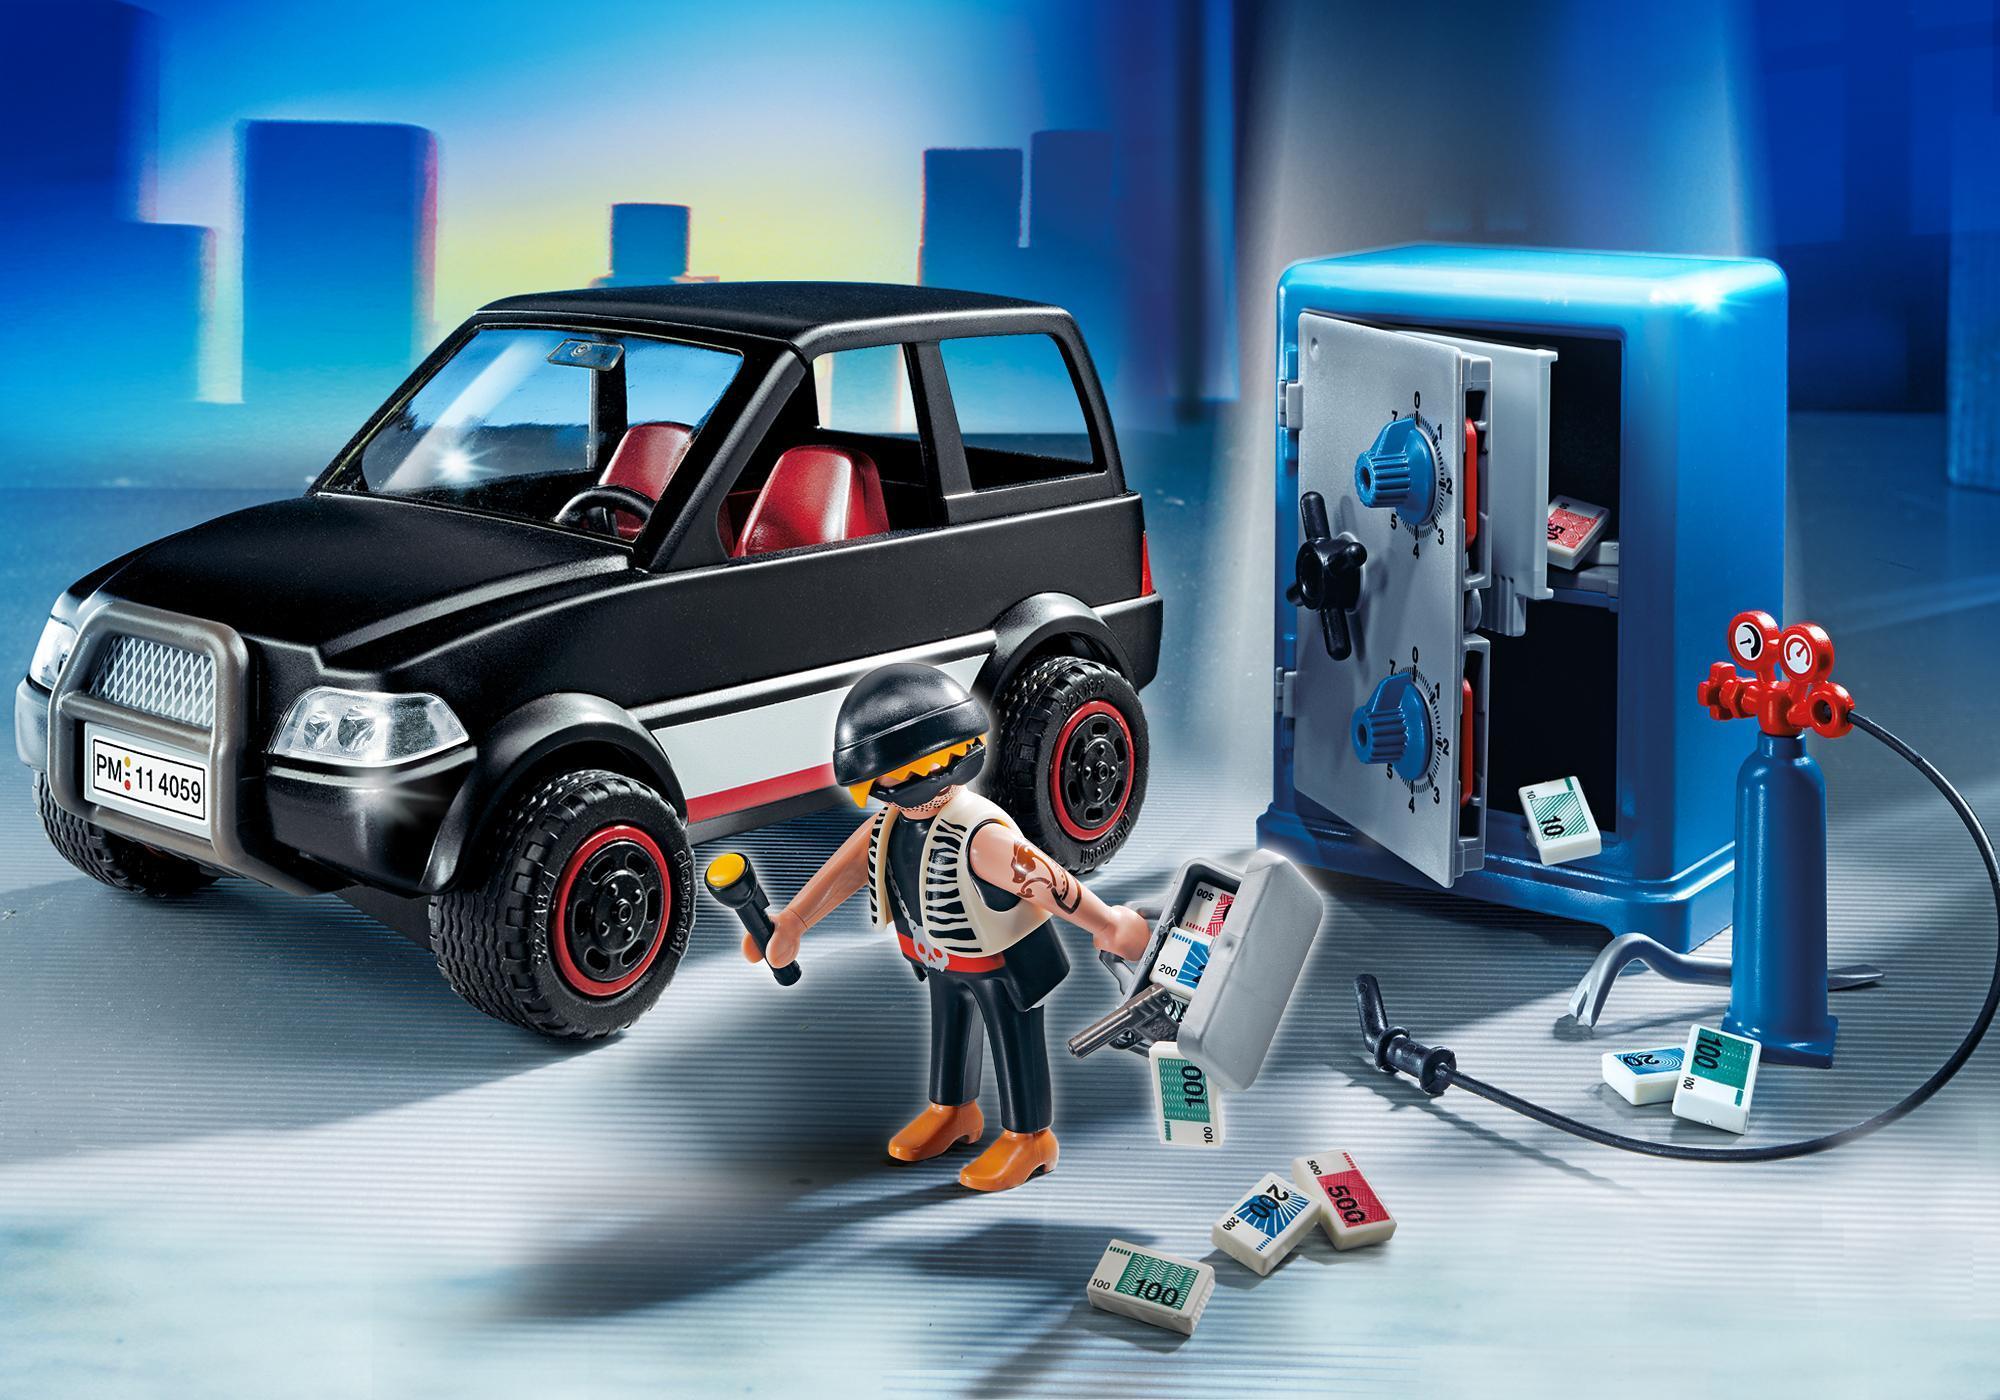 http://media.playmobil.com/i/playmobil/4059_product_detail/Thief with Safe and Getaway Car